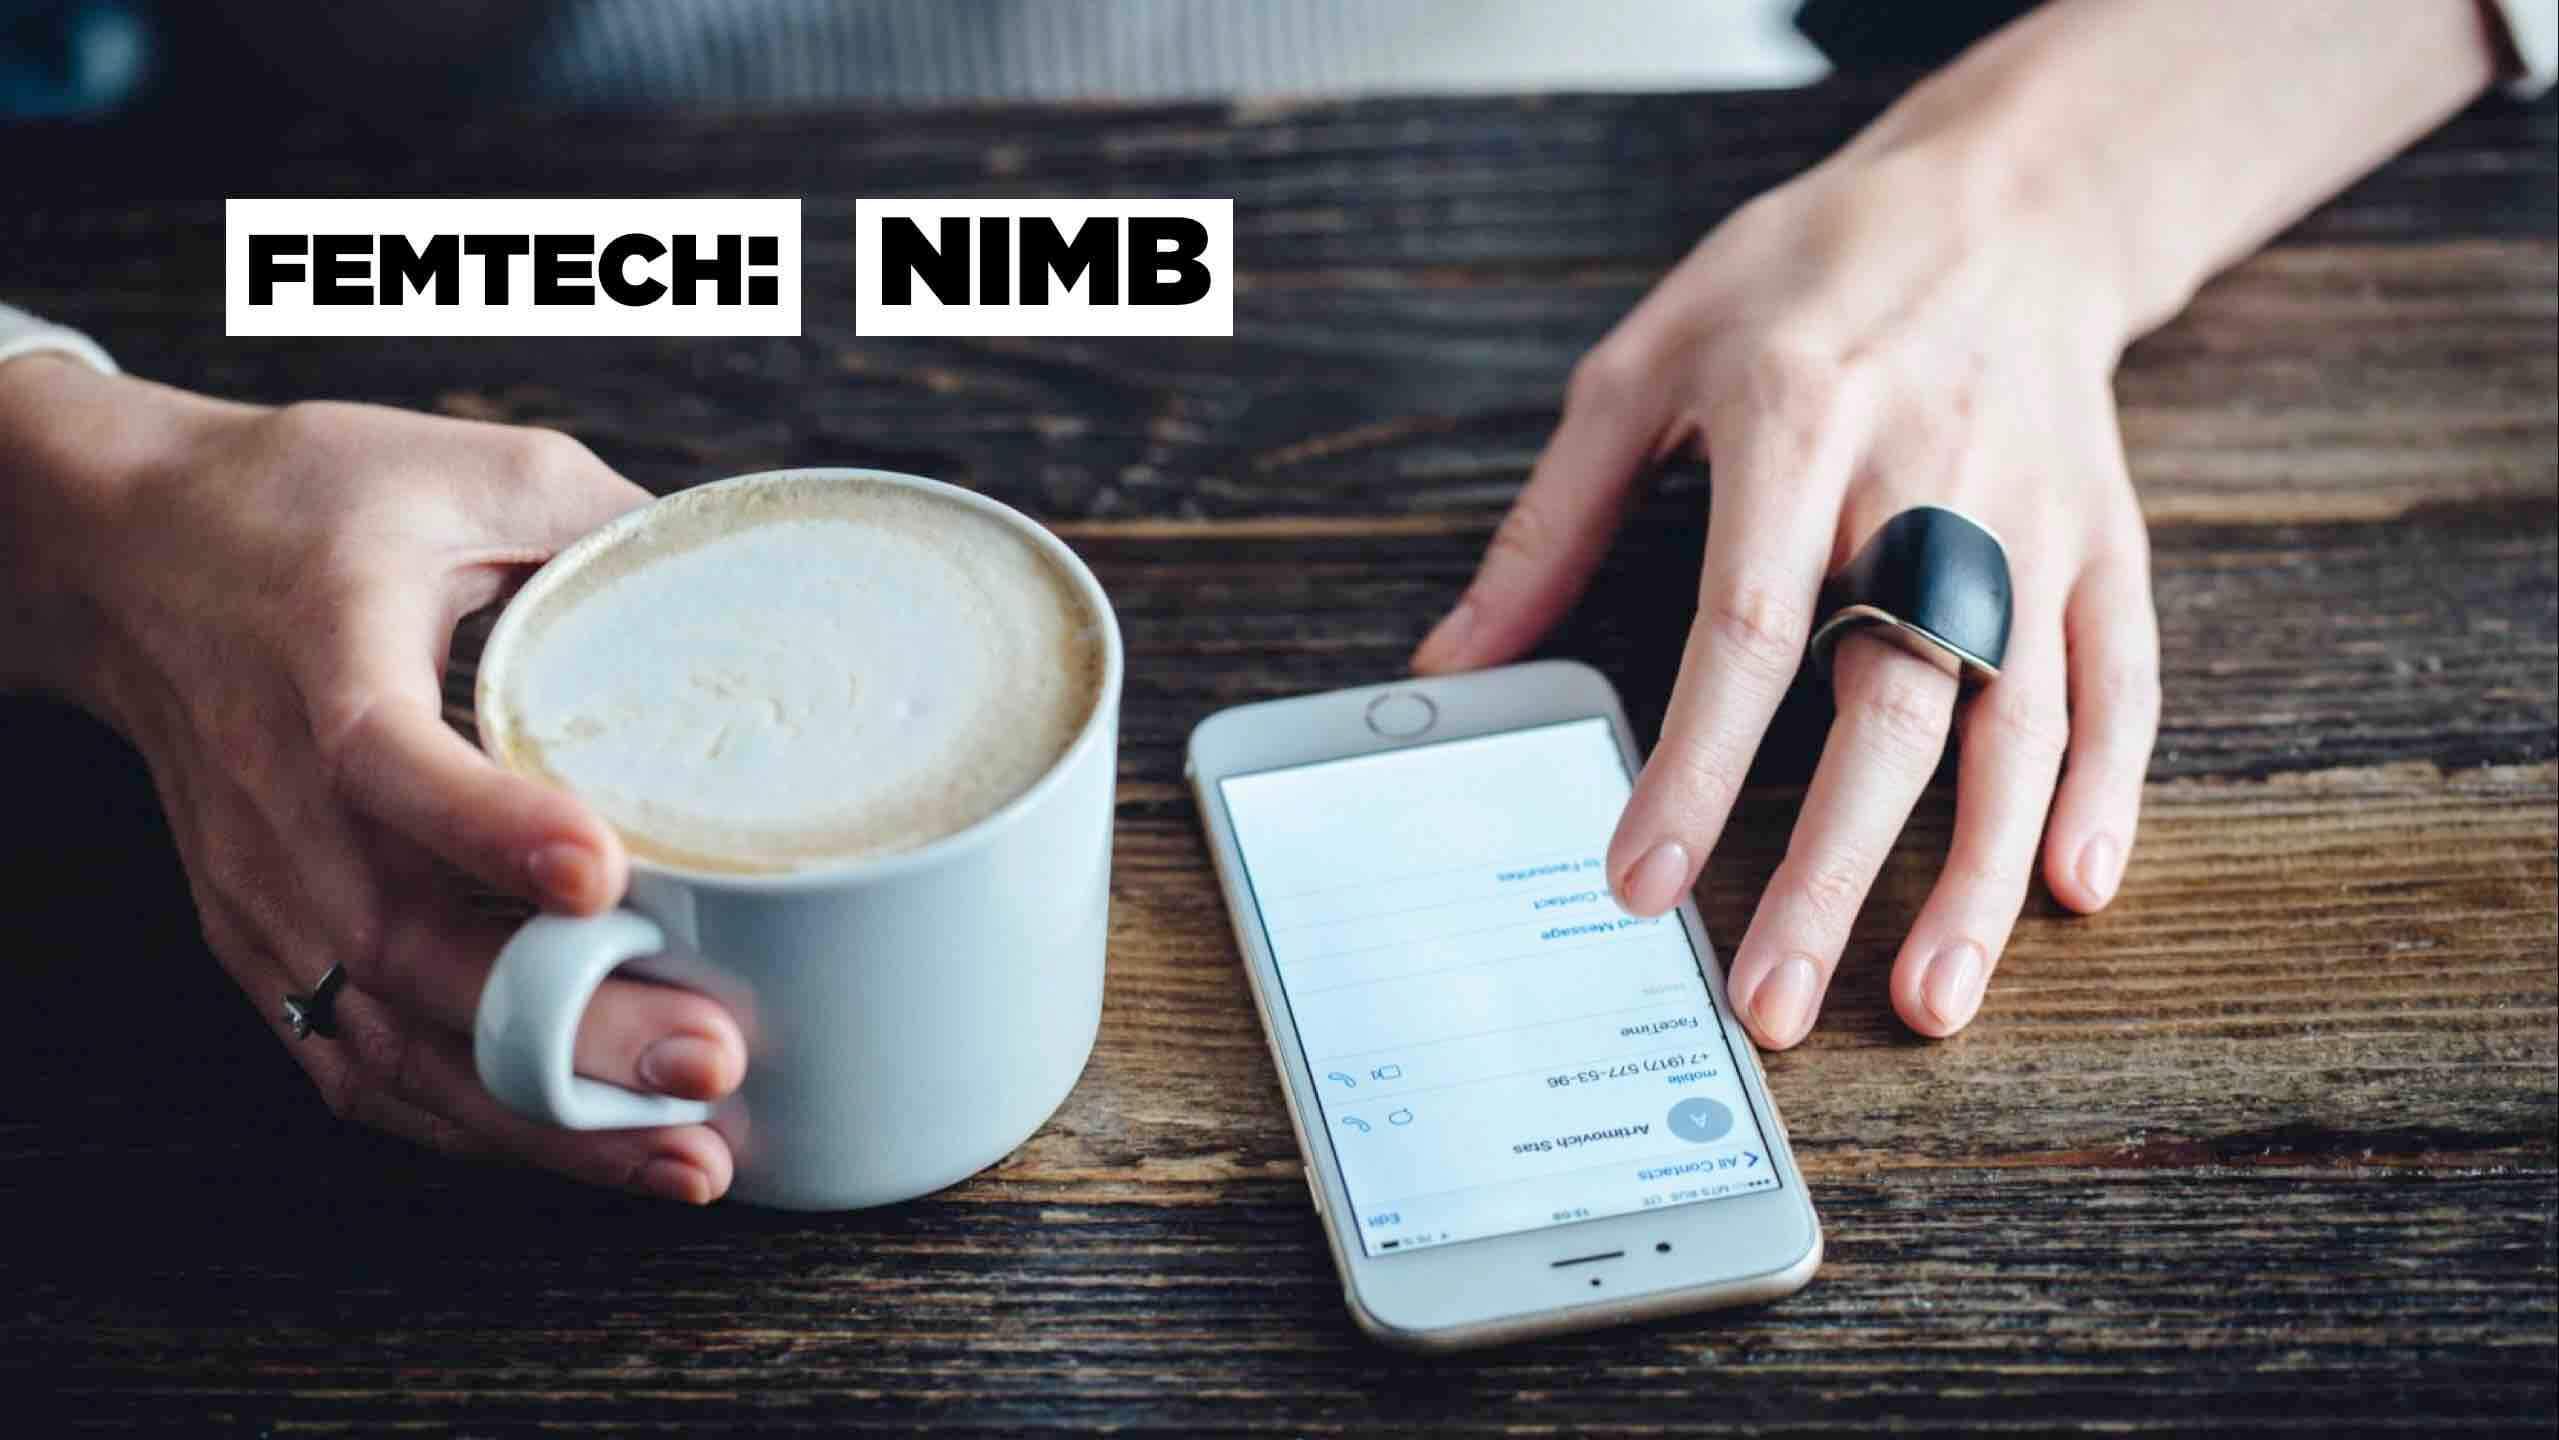 Nimb gyűrű FemTech